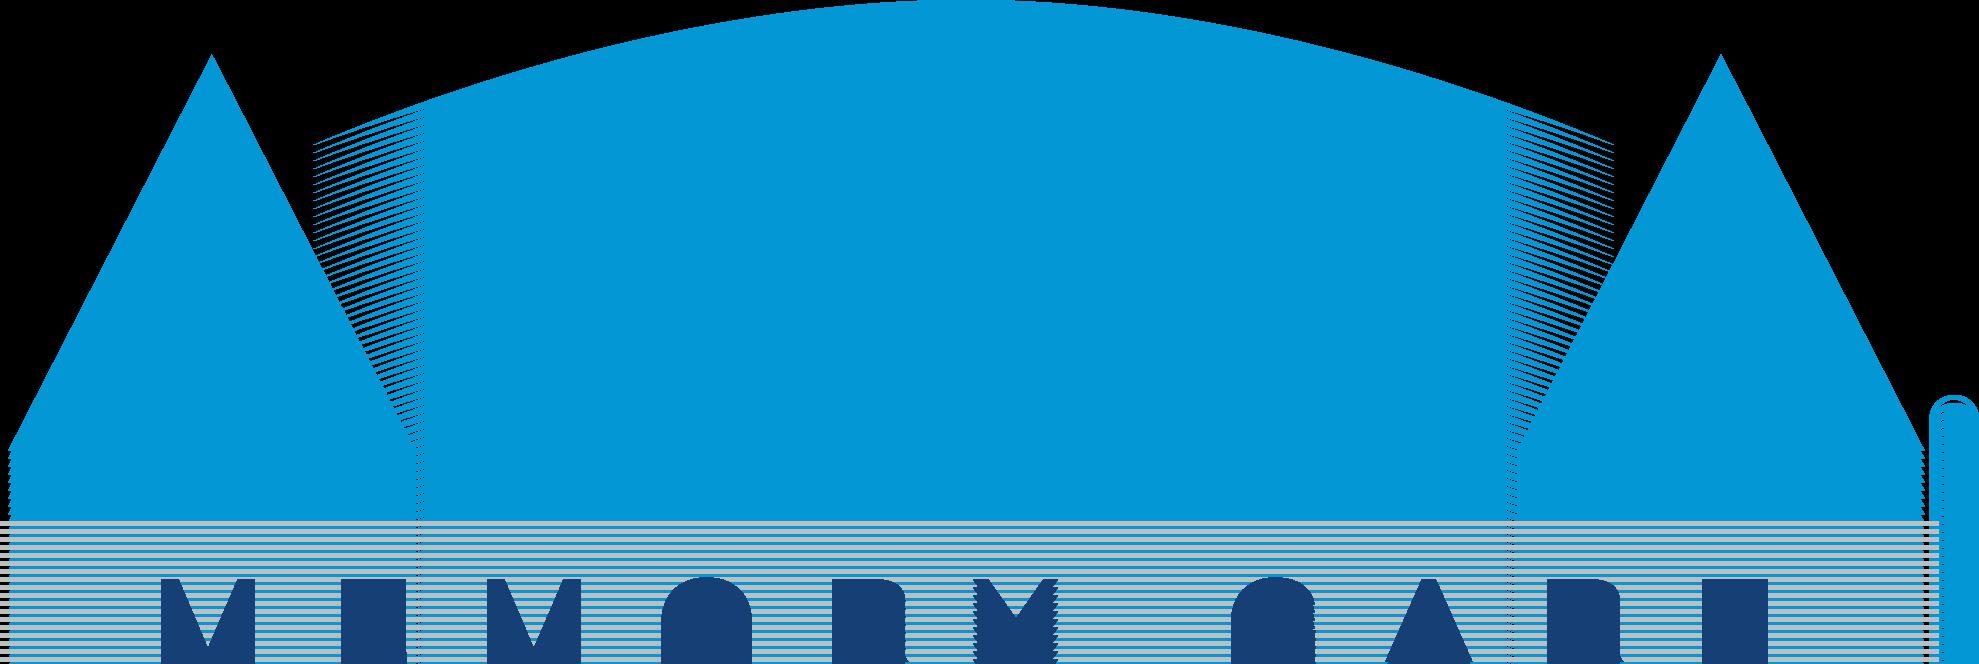 Azura Online Store